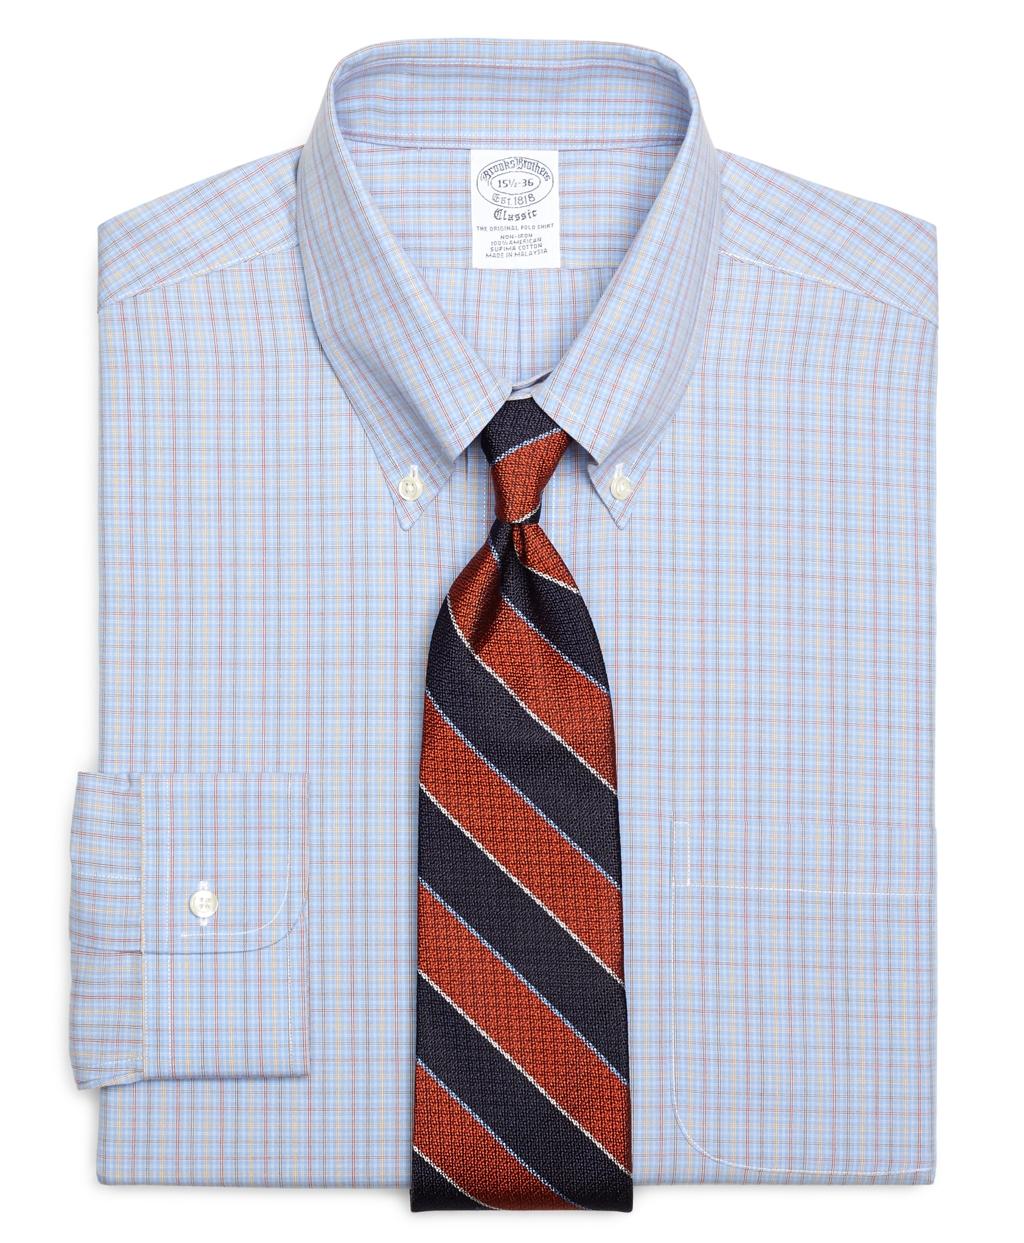 Brooks Brothers Non Iron Slim Fit Multicheck Dress Shirt